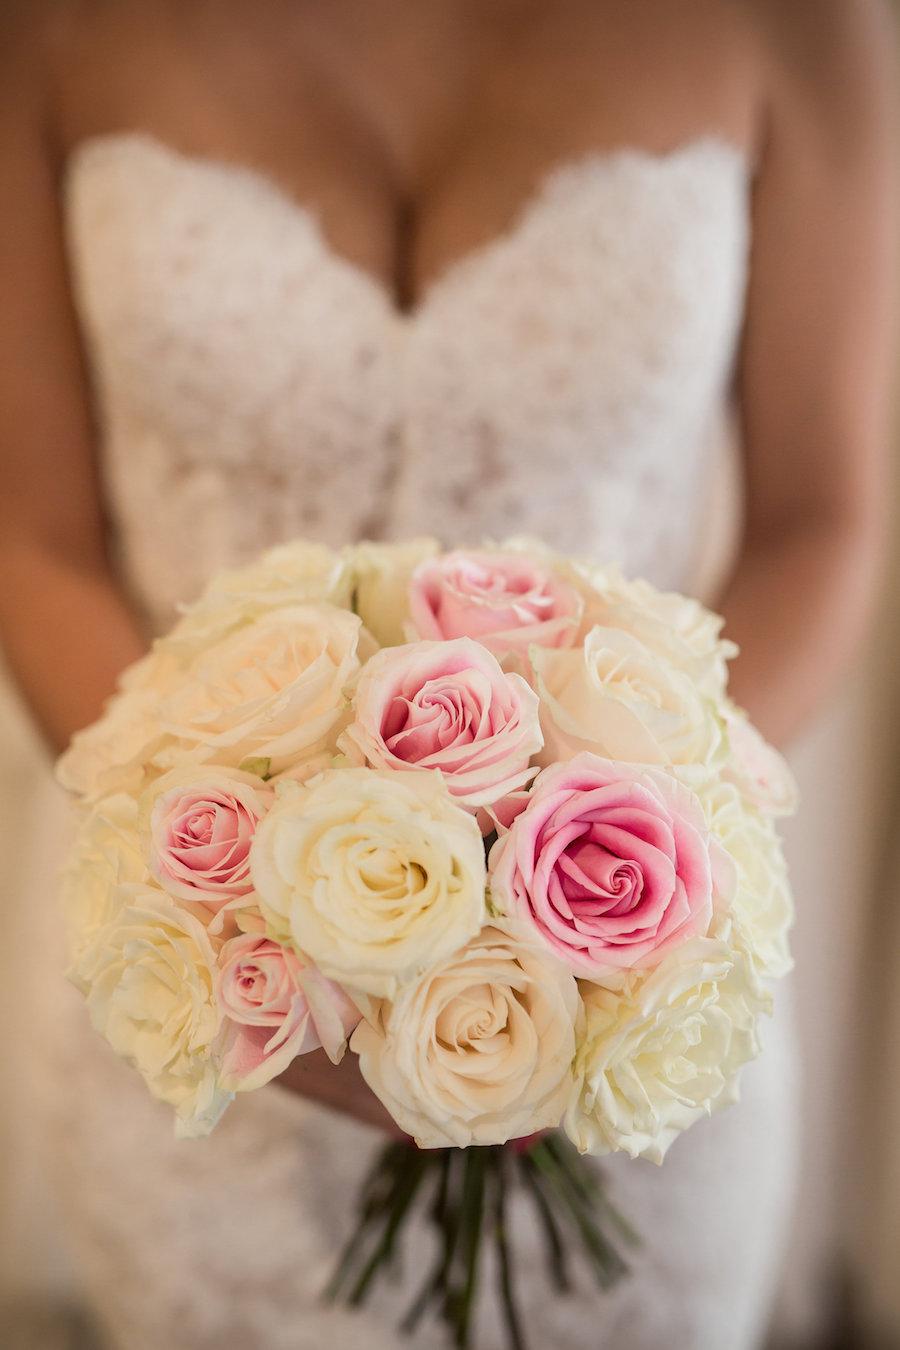 Traditional & Elegant Ivory and Blush Pink Bridal Wedding Bouquet